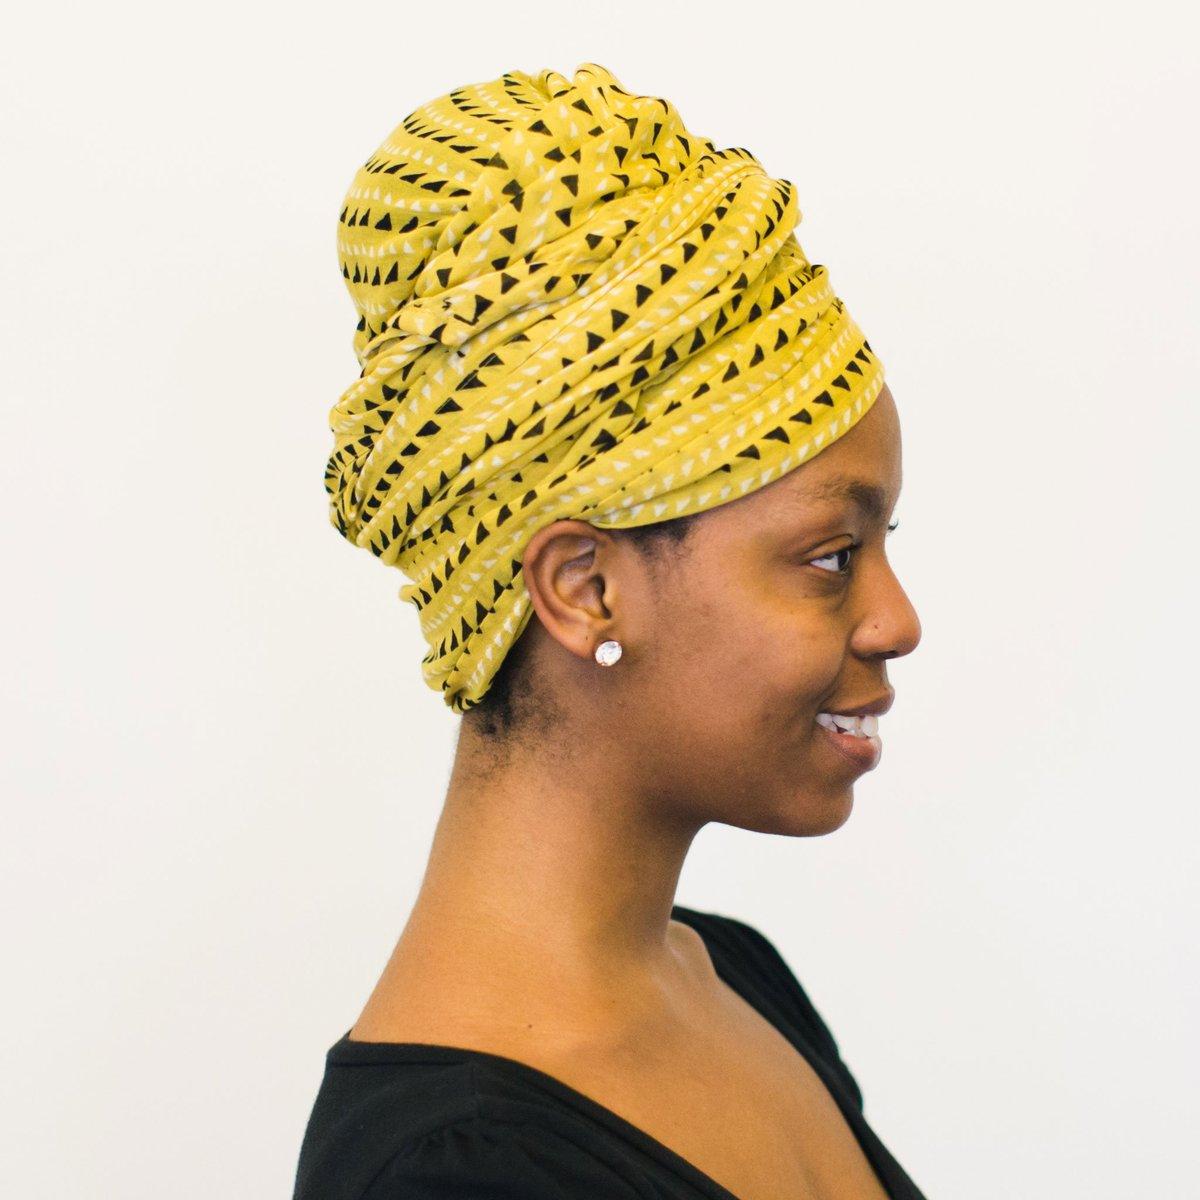 Image of Trinidad Mustard Block Printed Scarf